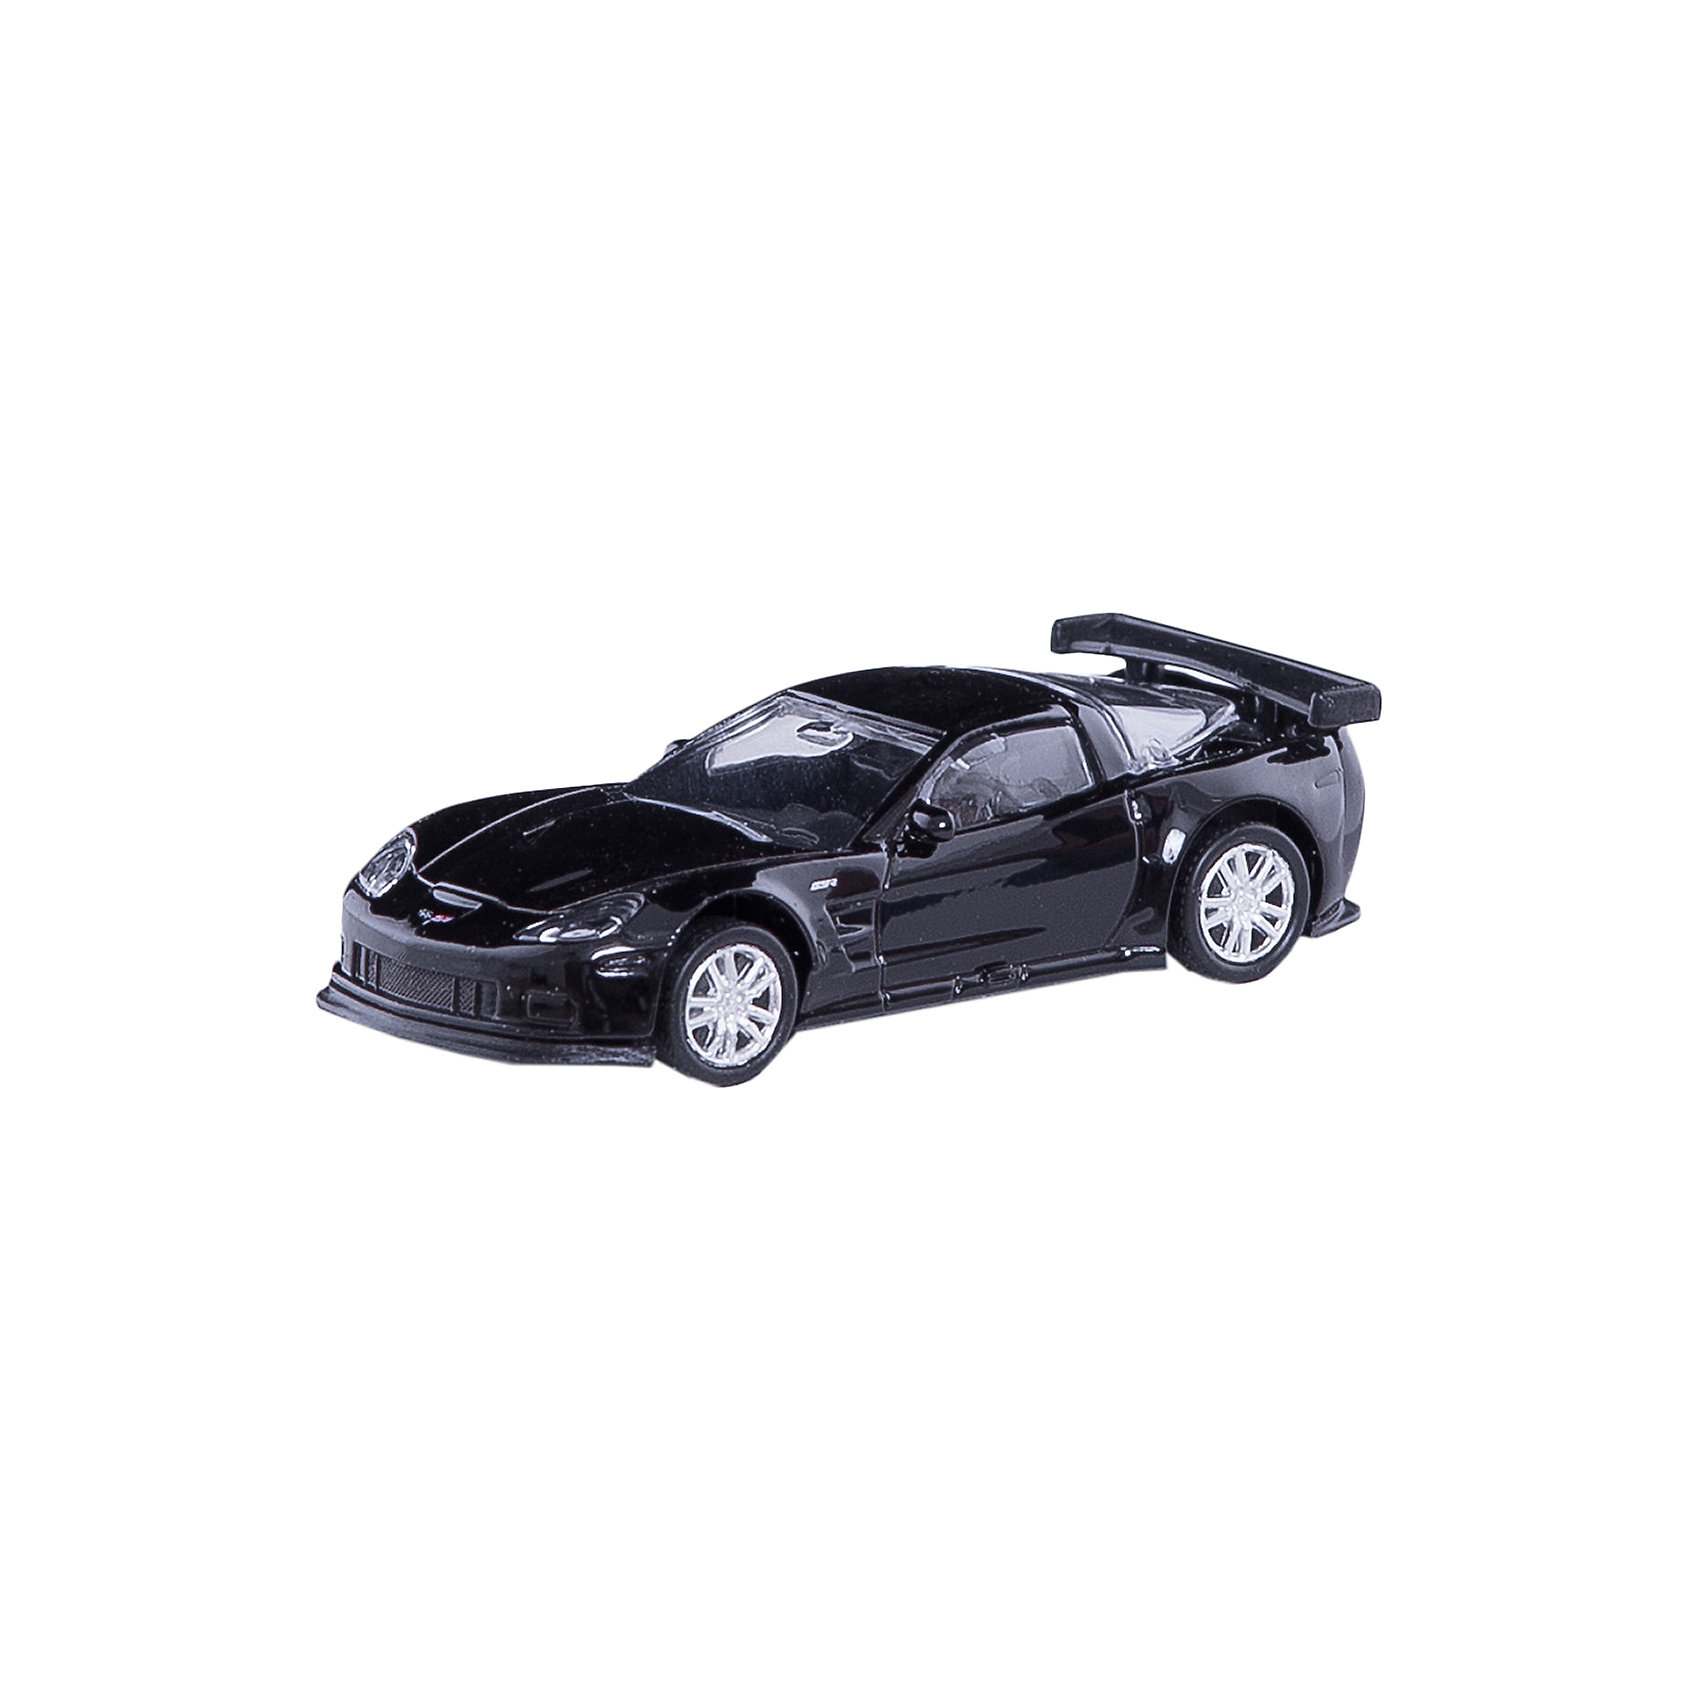 Машинка Chevrolet Corvette C6-R 3, AutotimeМашинки<br><br><br>Ширина мм: 90<br>Глубина мм: 42<br>Высота мм: 40<br>Вес г: 13<br>Возраст от месяцев: 36<br>Возраст до месяцев: 2147483647<br>Пол: Мужской<br>Возраст: Детский<br>SKU: 5584084